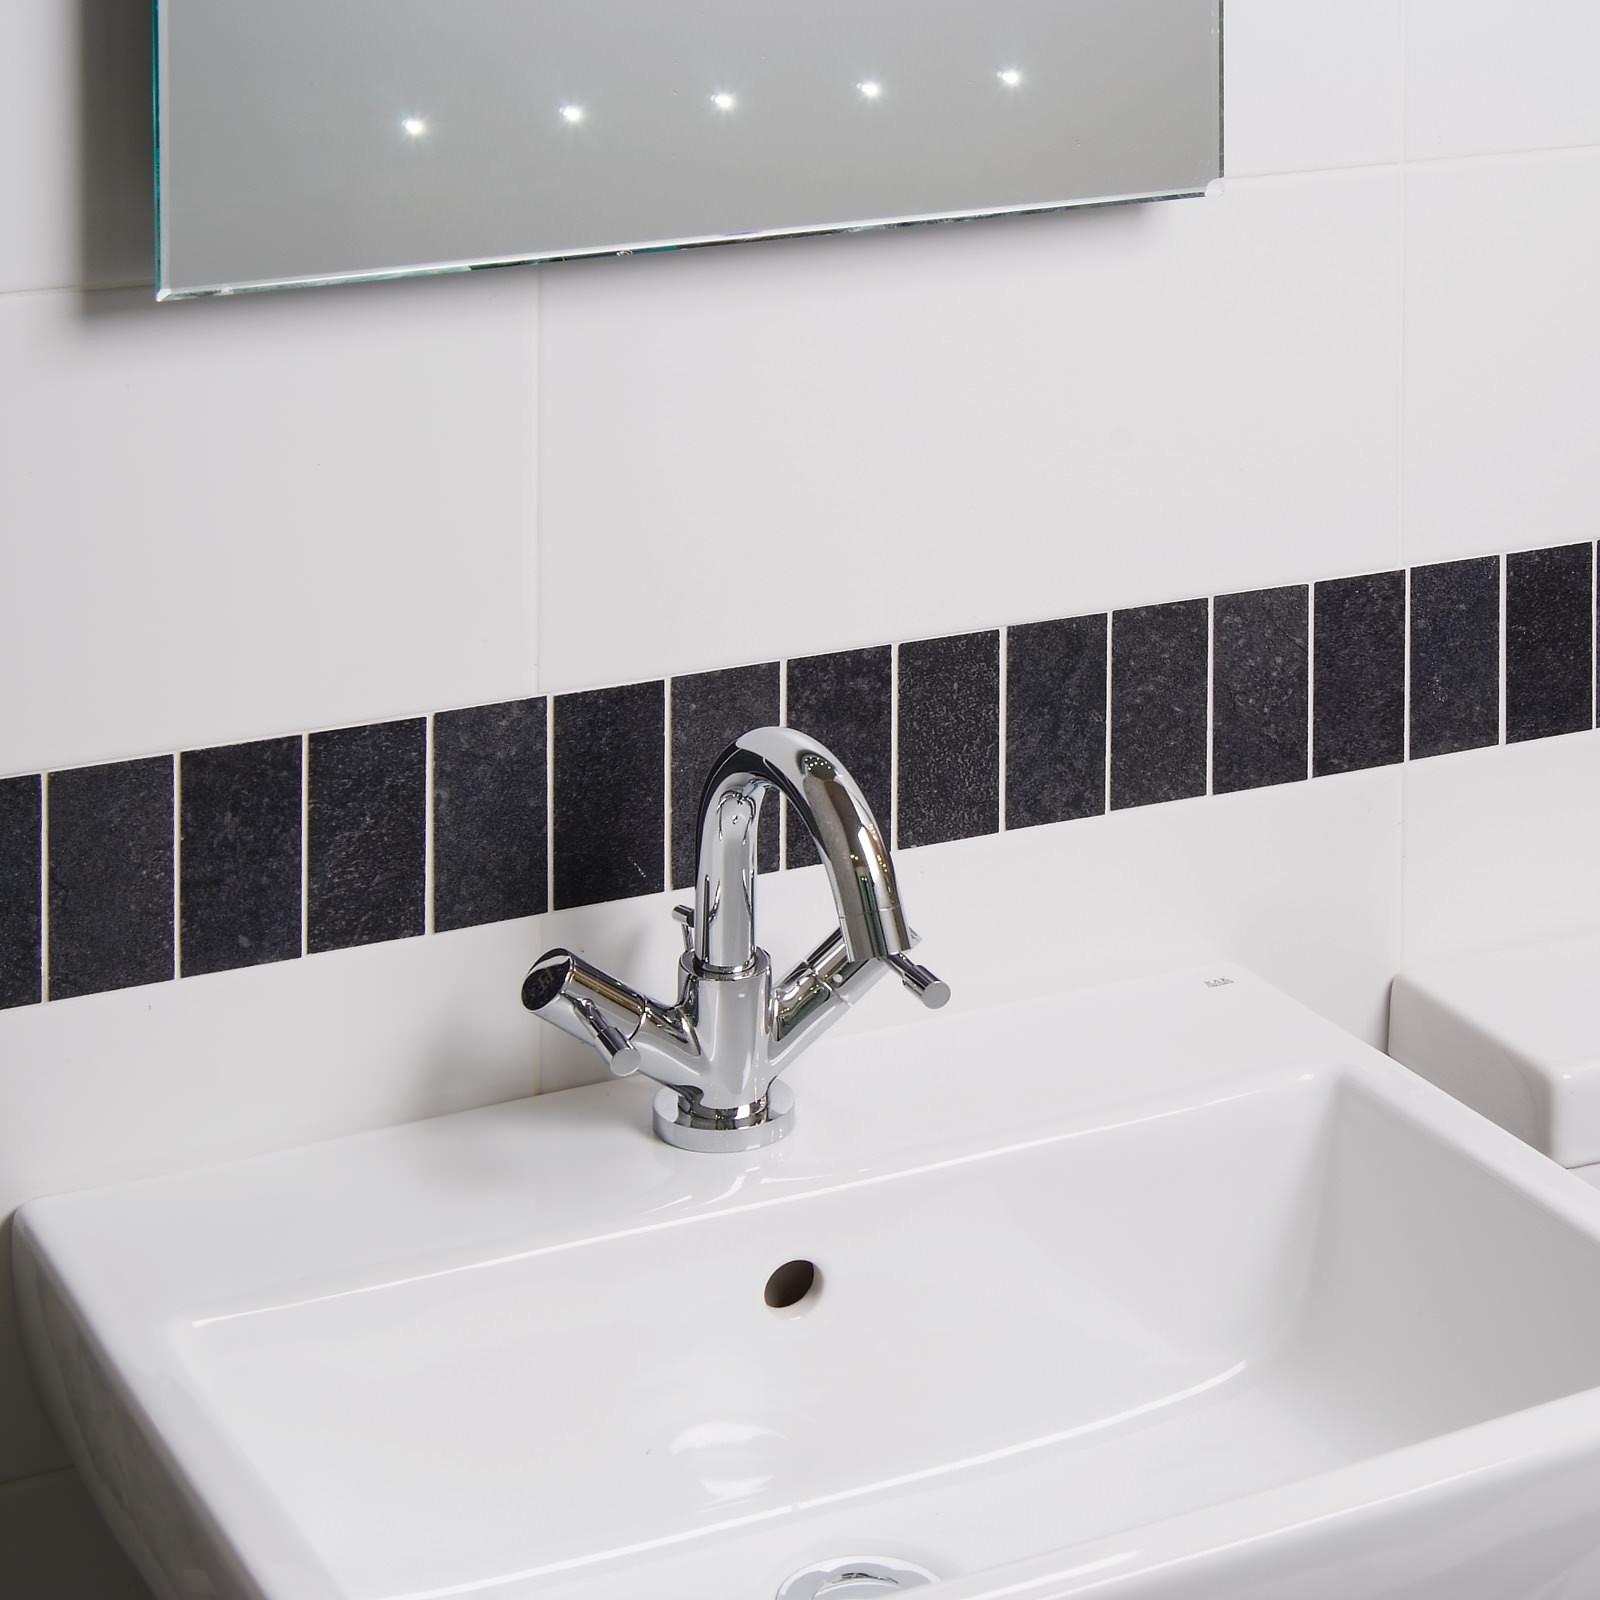 Moon Blanco Wall Tile - Matt black bathroom tiles